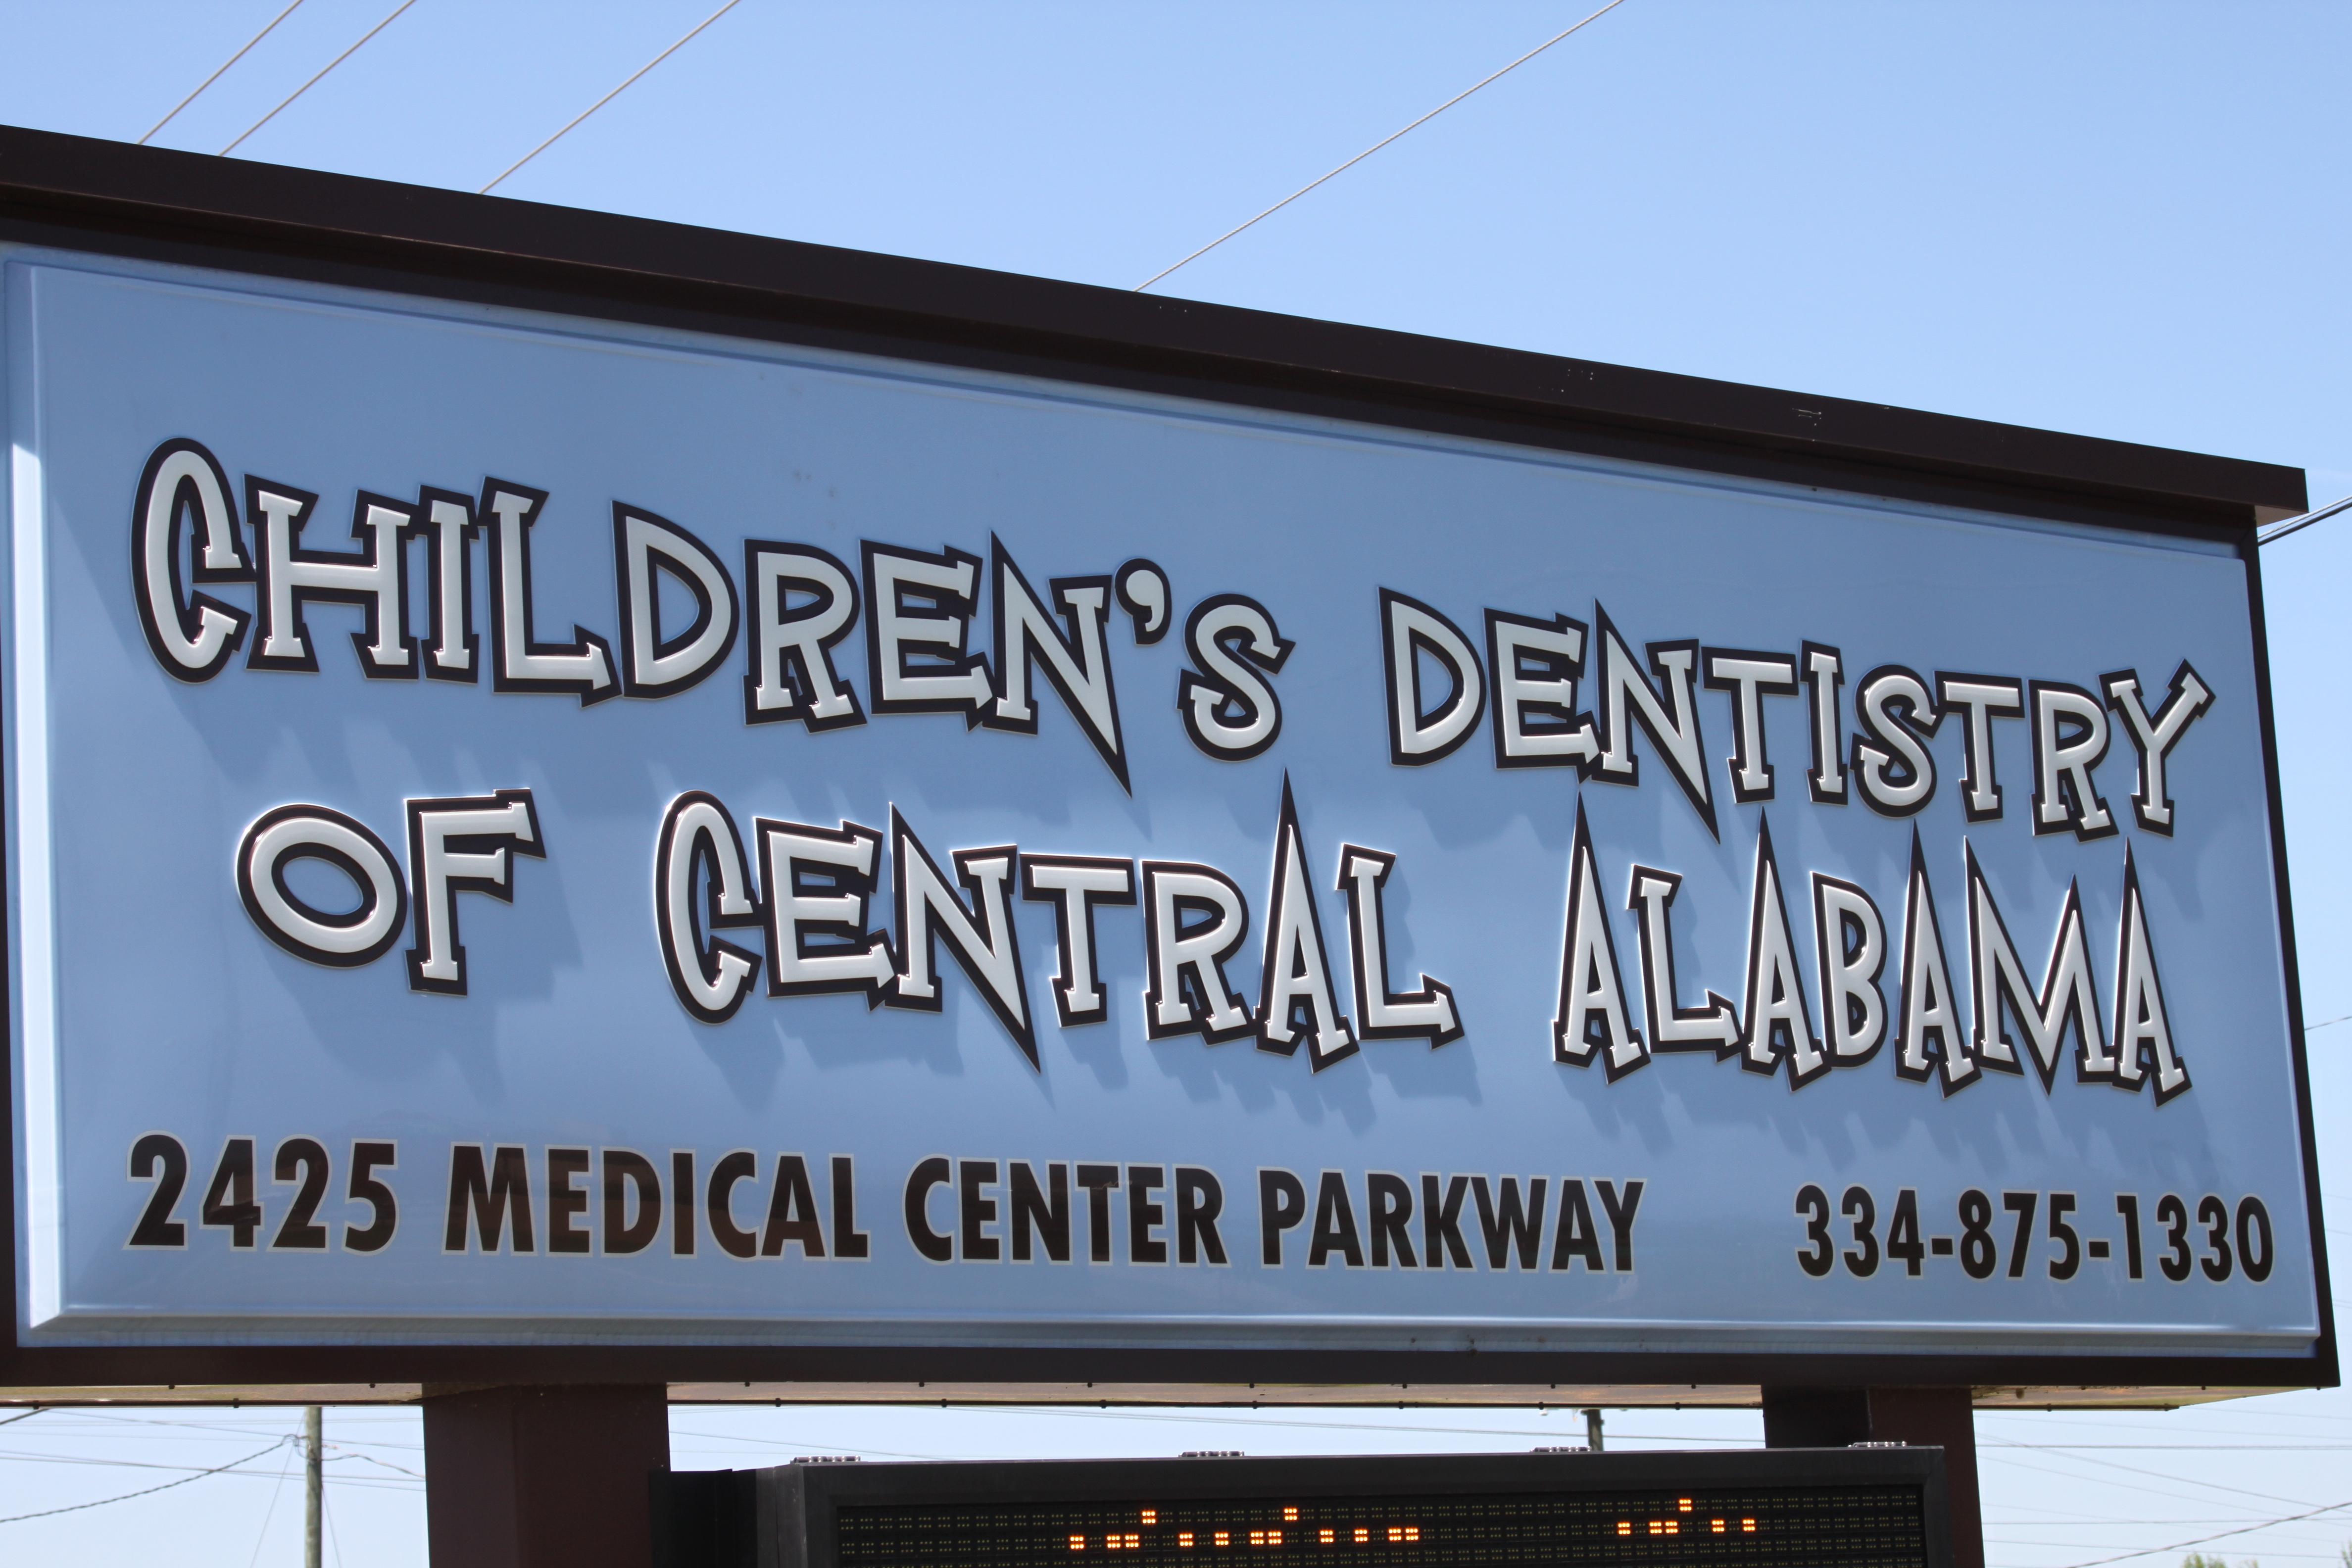 Children's Dentistry of Central Alabama image 0